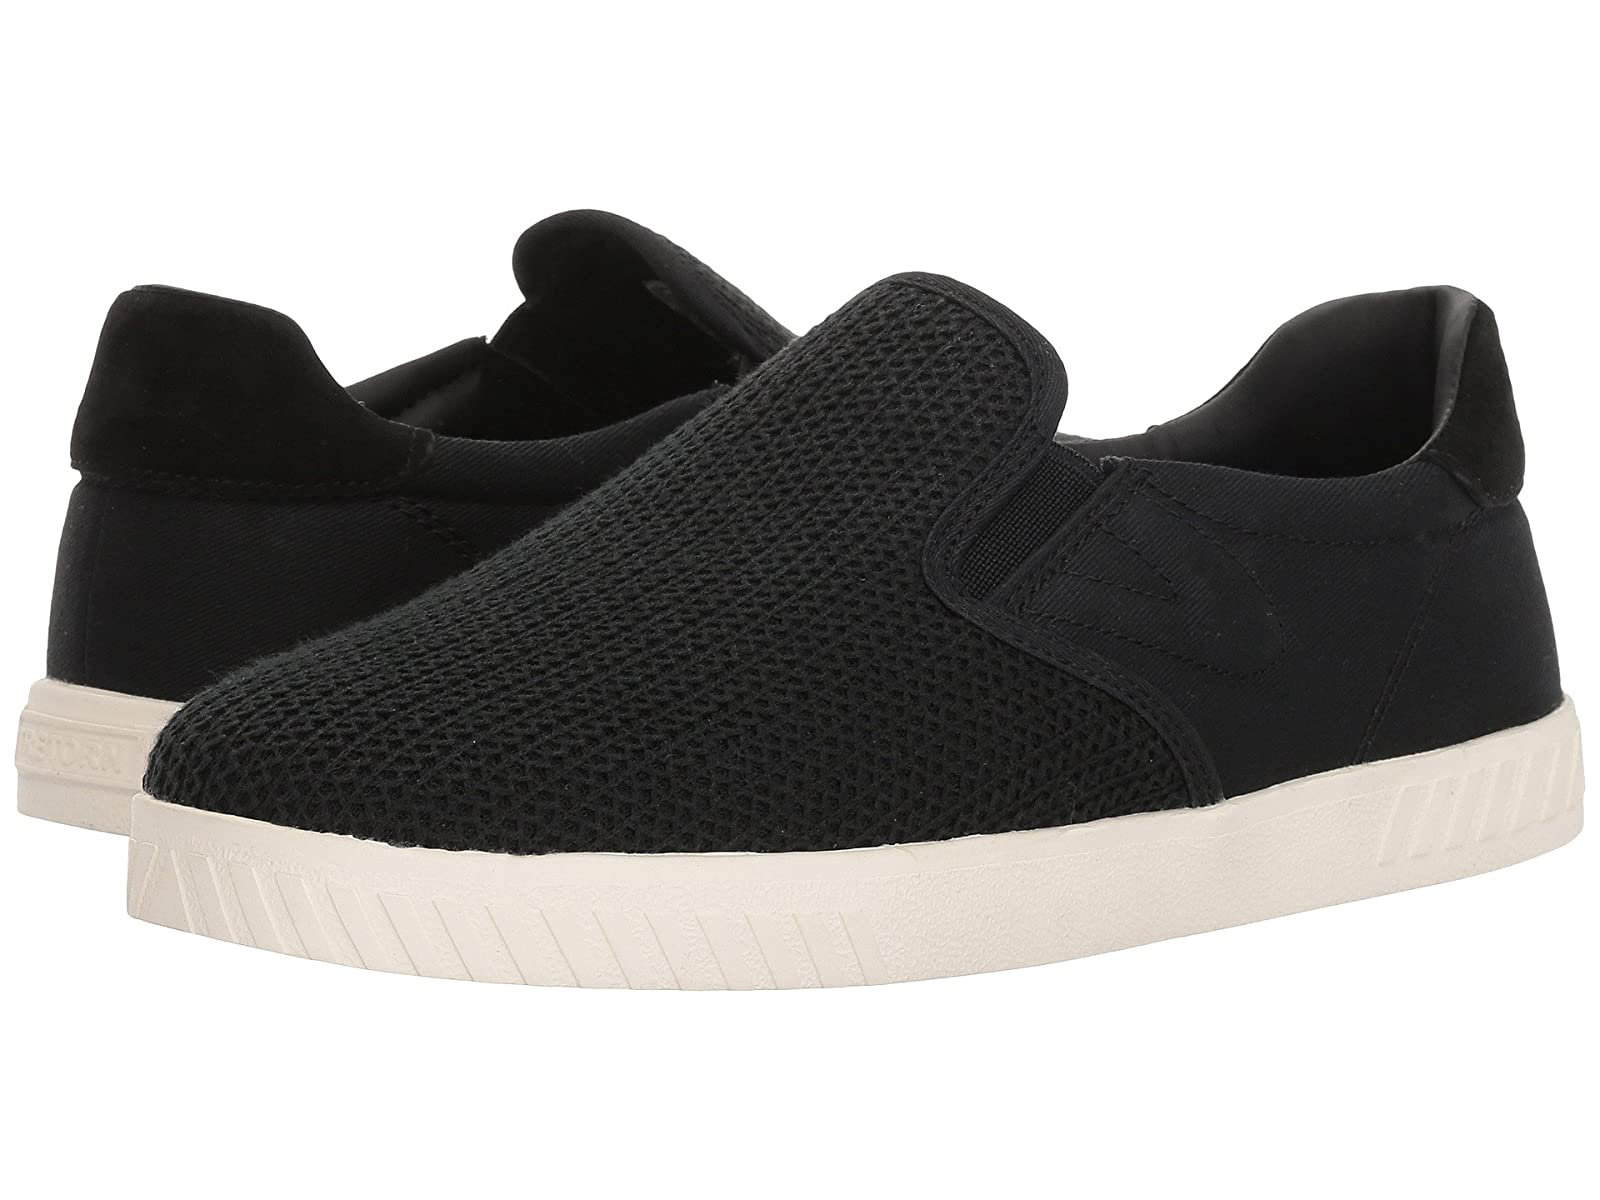 Tretorn CruzAtmospheric grades have affordable shoes